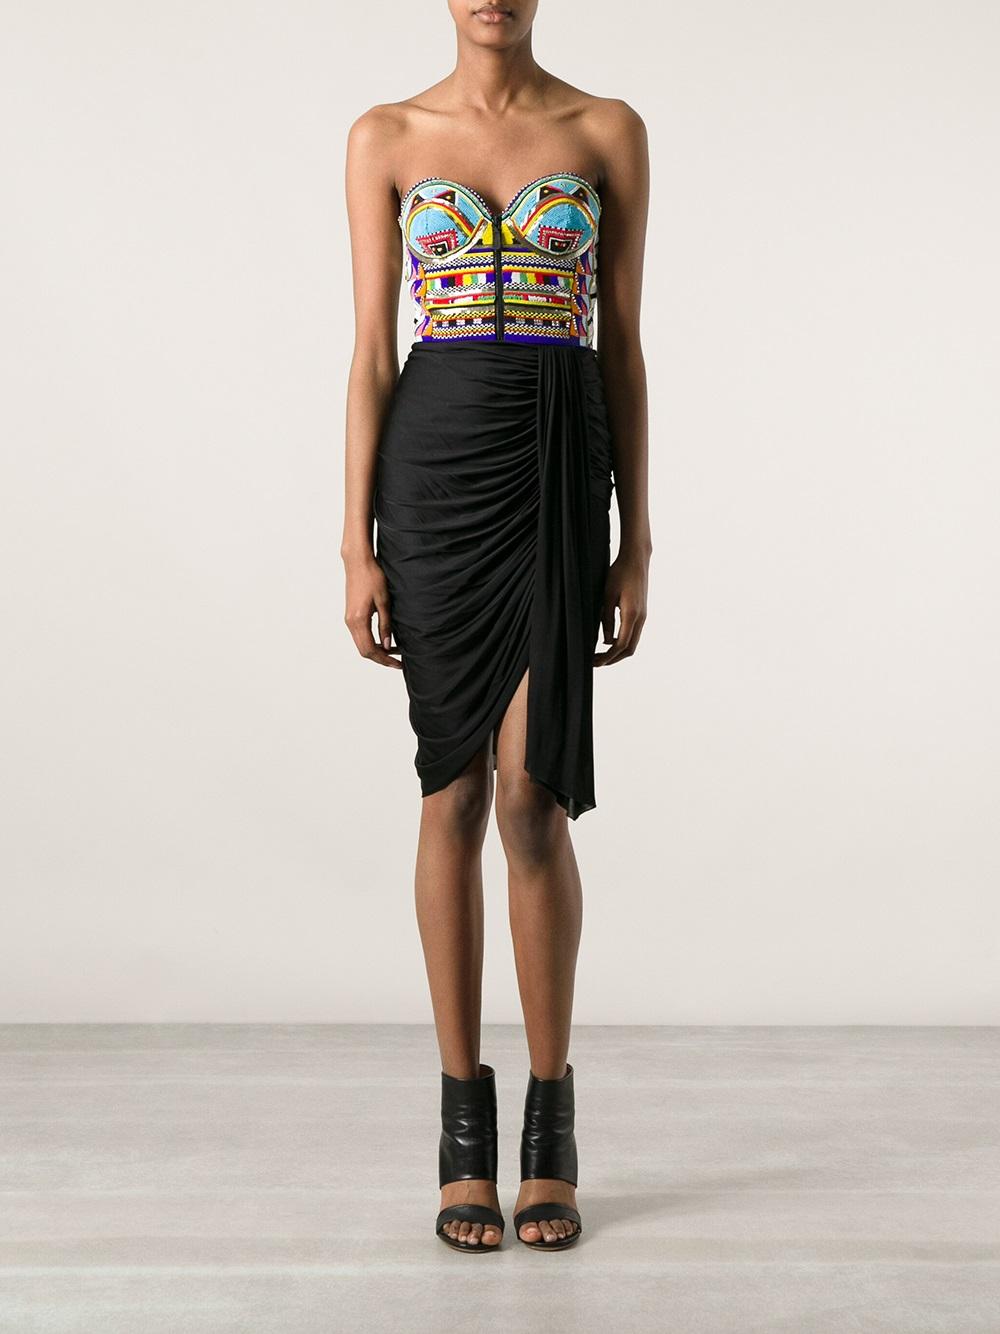 Emilio Pucci Beaded Bustier Dress - Luisa World - Farfetch.com